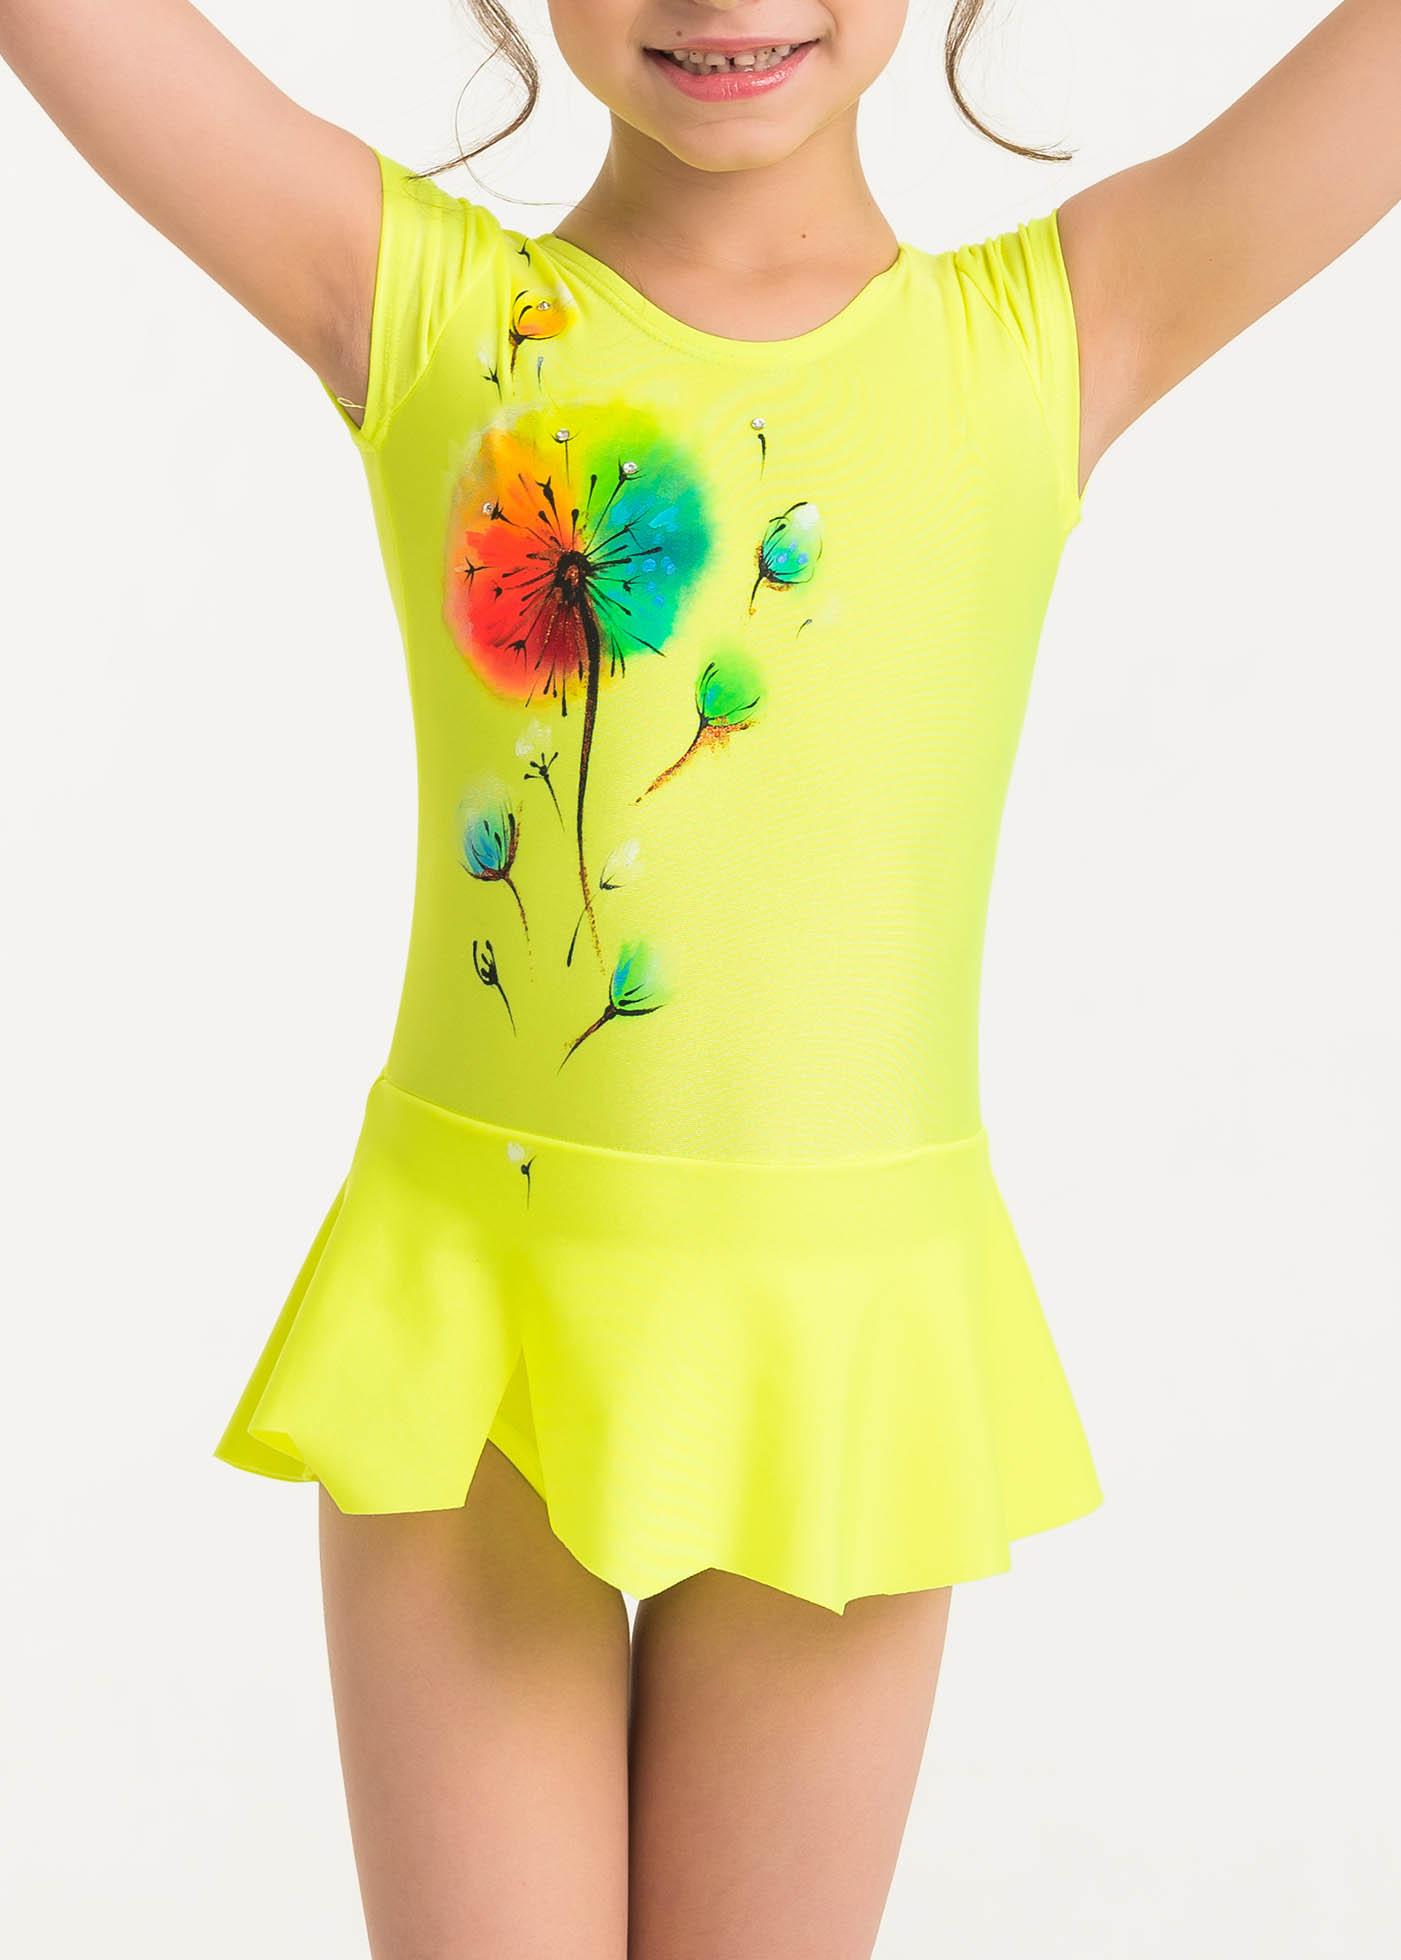 Competition Leotards, Seven-color flower, pic 1